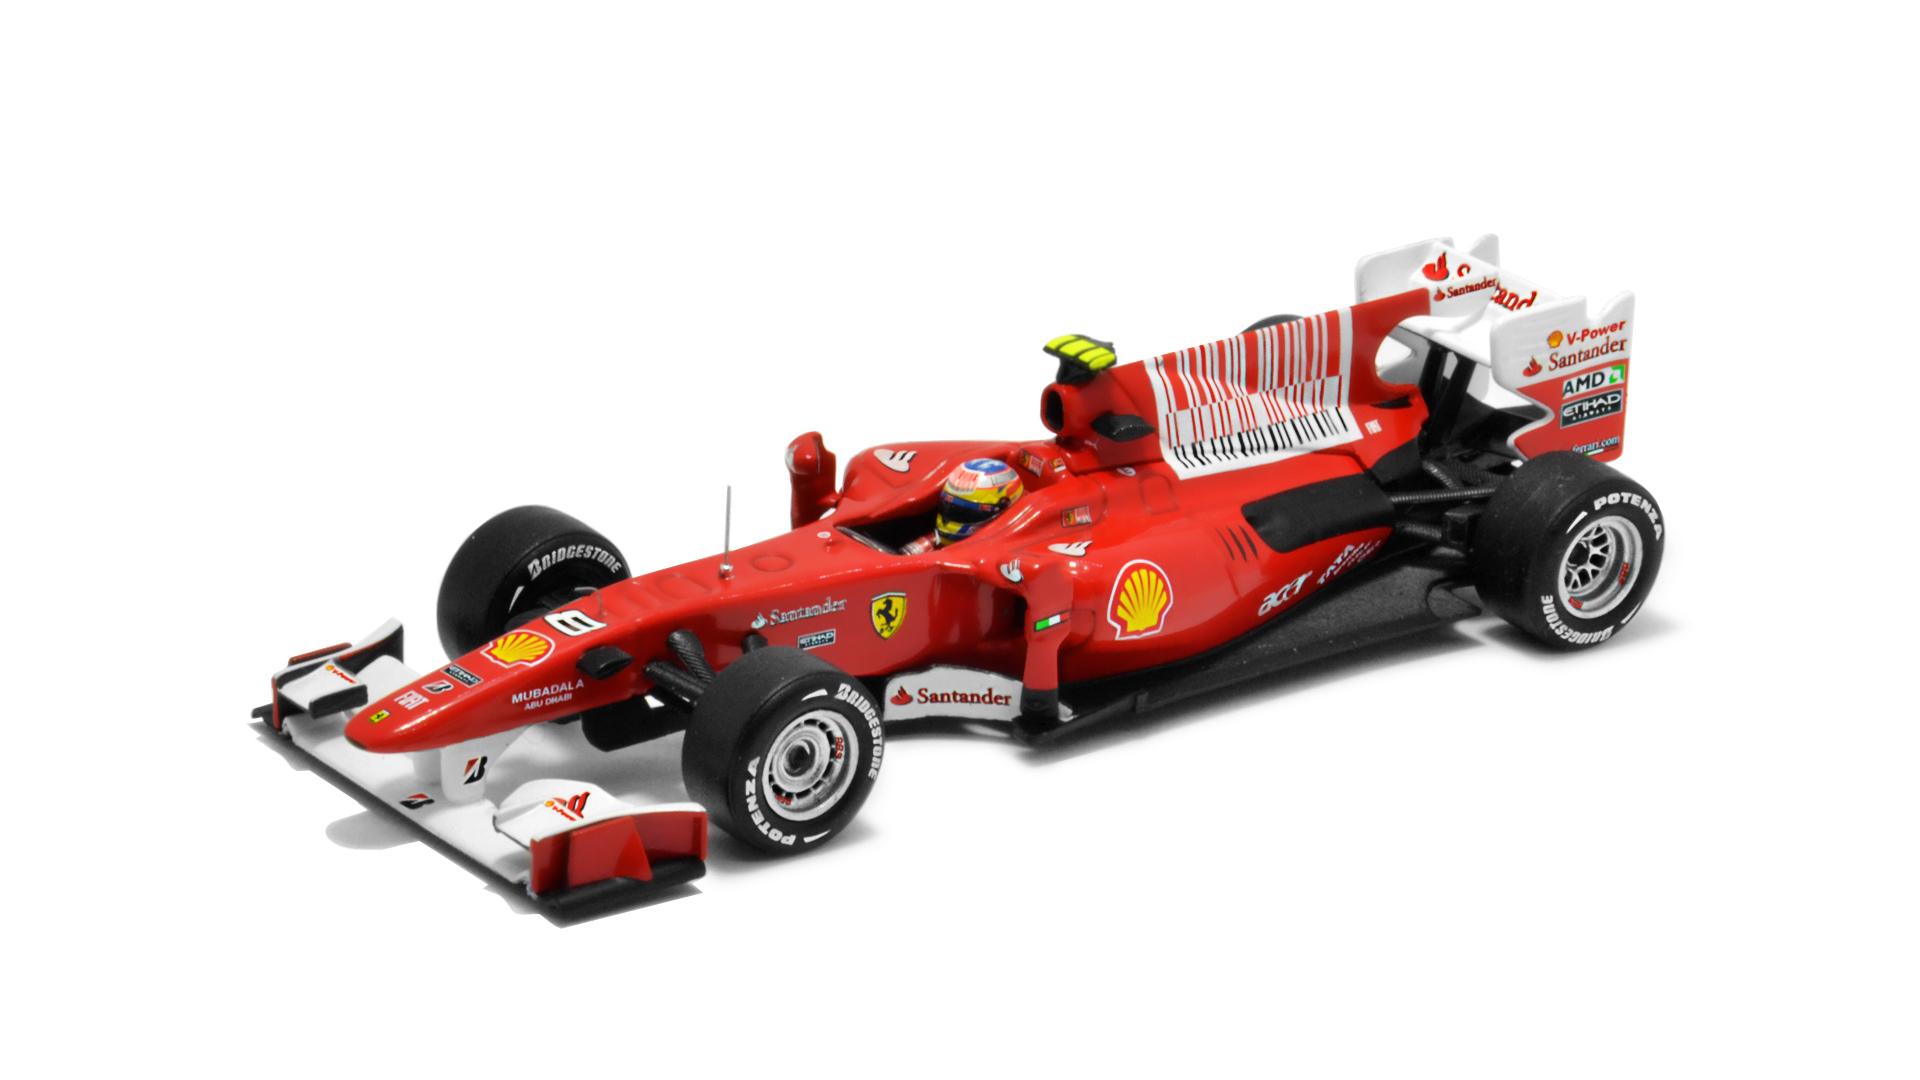 Év: 2010<br />Modell: F10<br />Gyártó: Hot Wheels<br />Pilóta: Fernando Alonso